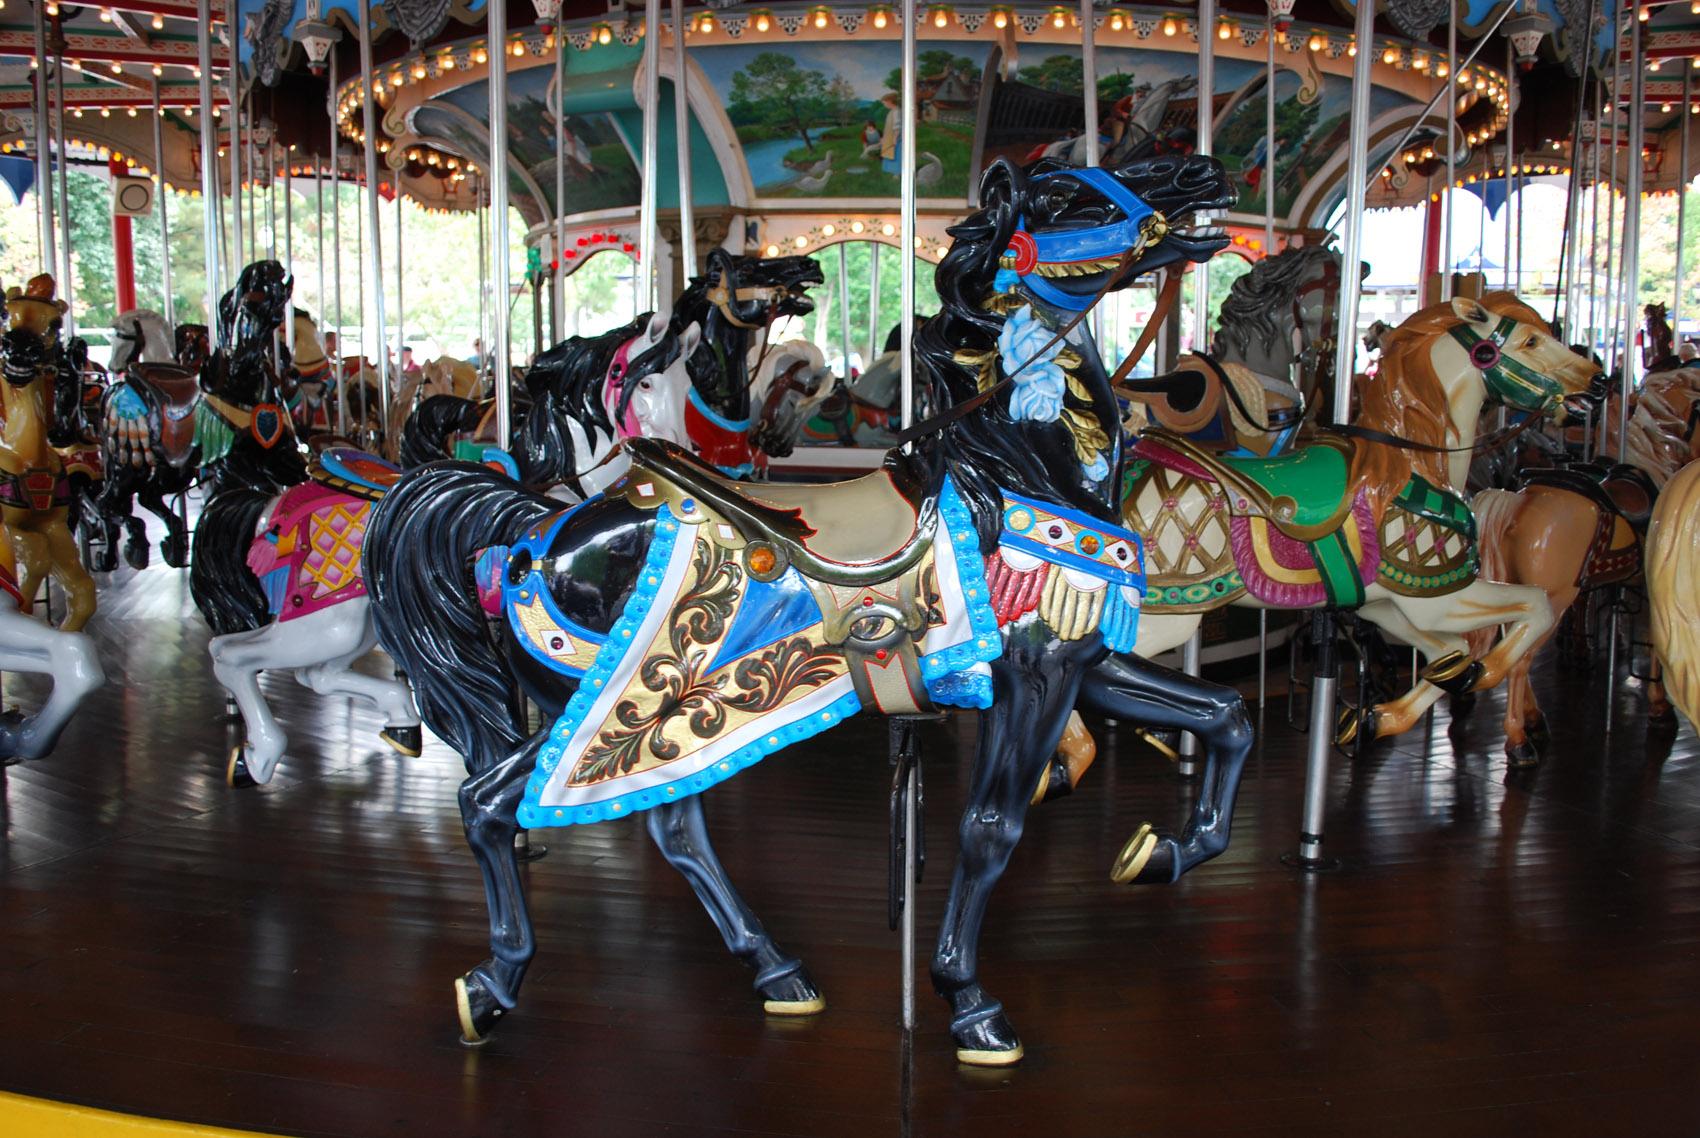 Ca-1919-Hersheypark-PTC-47-carousel-horse-0303